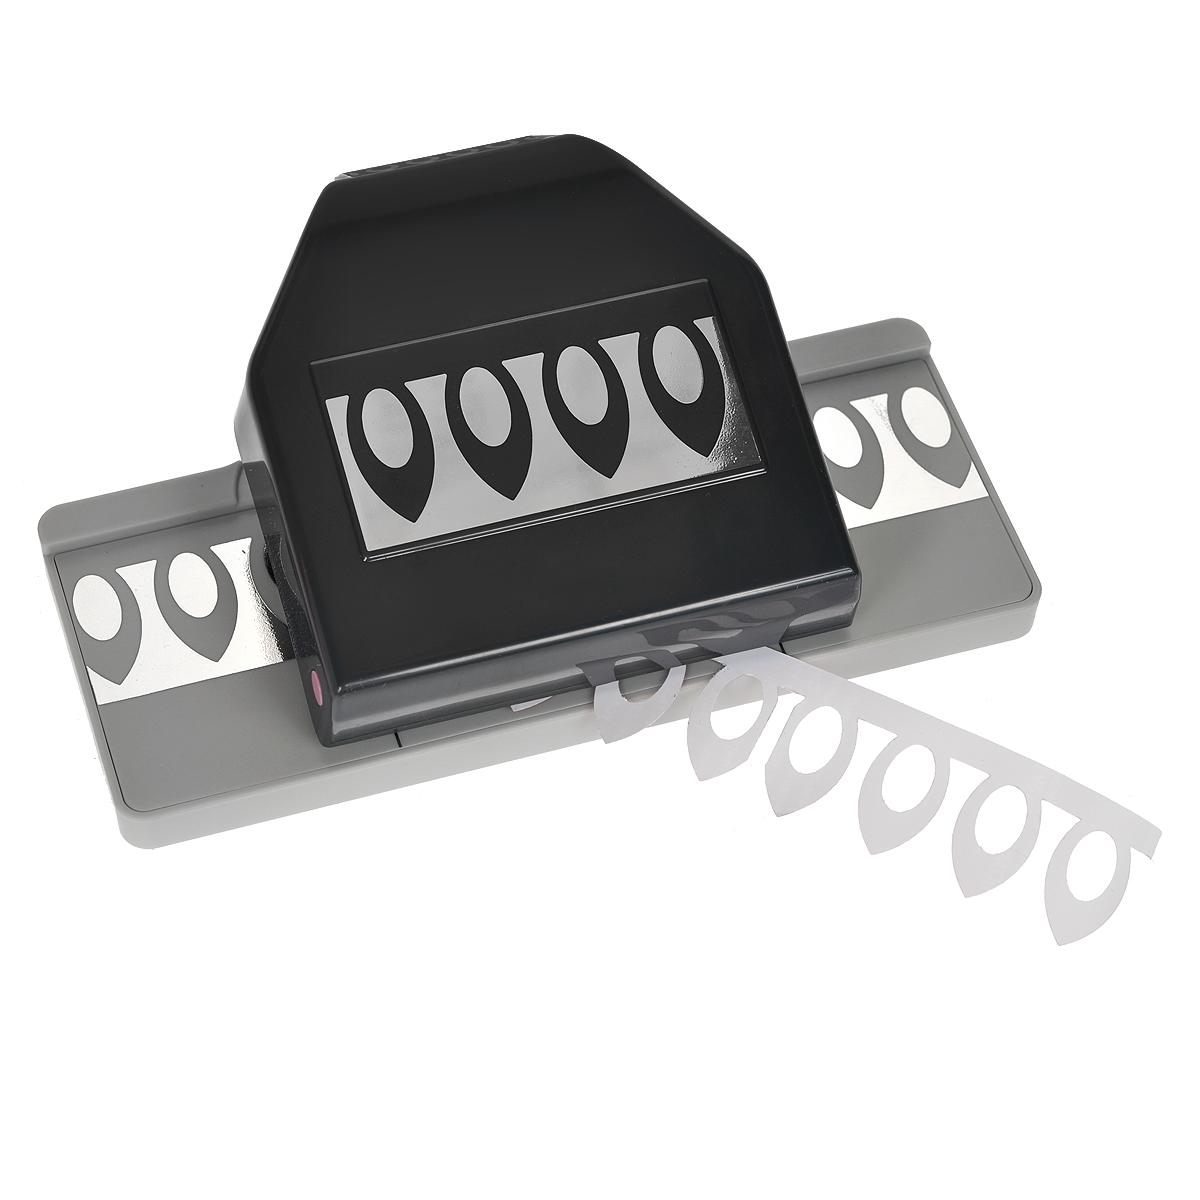 Фигурный дырокол EK Tools  Лепестки: Астра . EKS-54-51001 - Степлеры, дыроколы